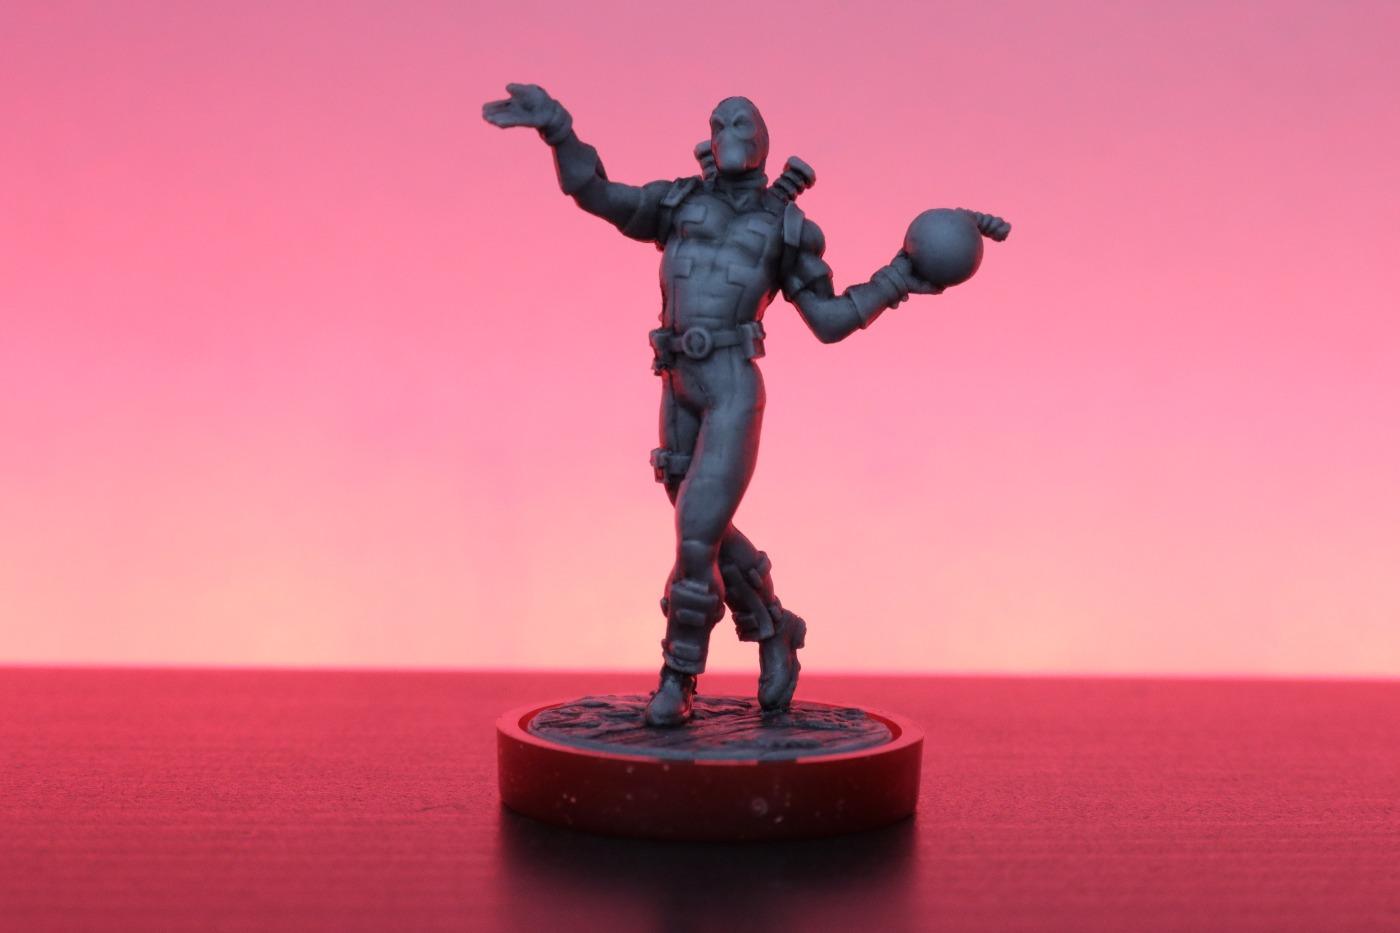 Unmatched: Deadpool miniature